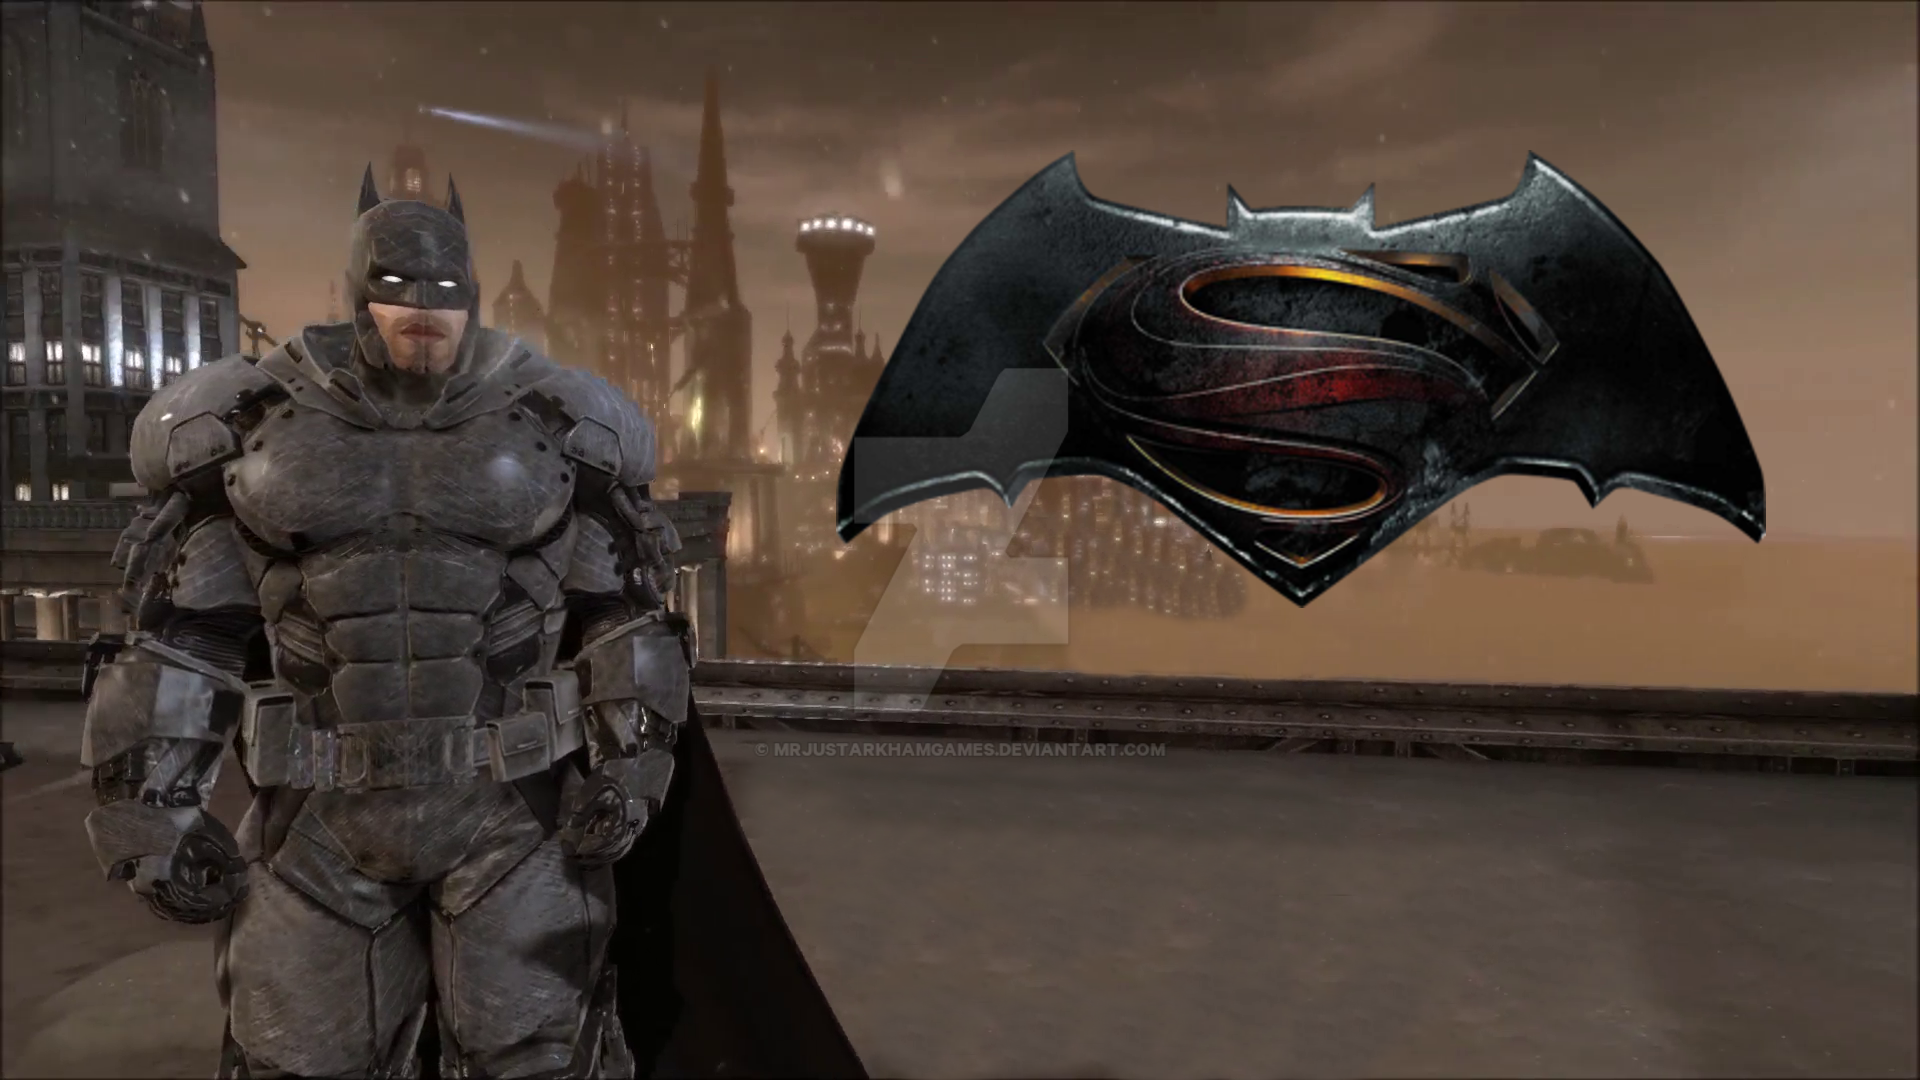 MrJustArkhamGames Batman Vs Superman Armoured Suit Final By